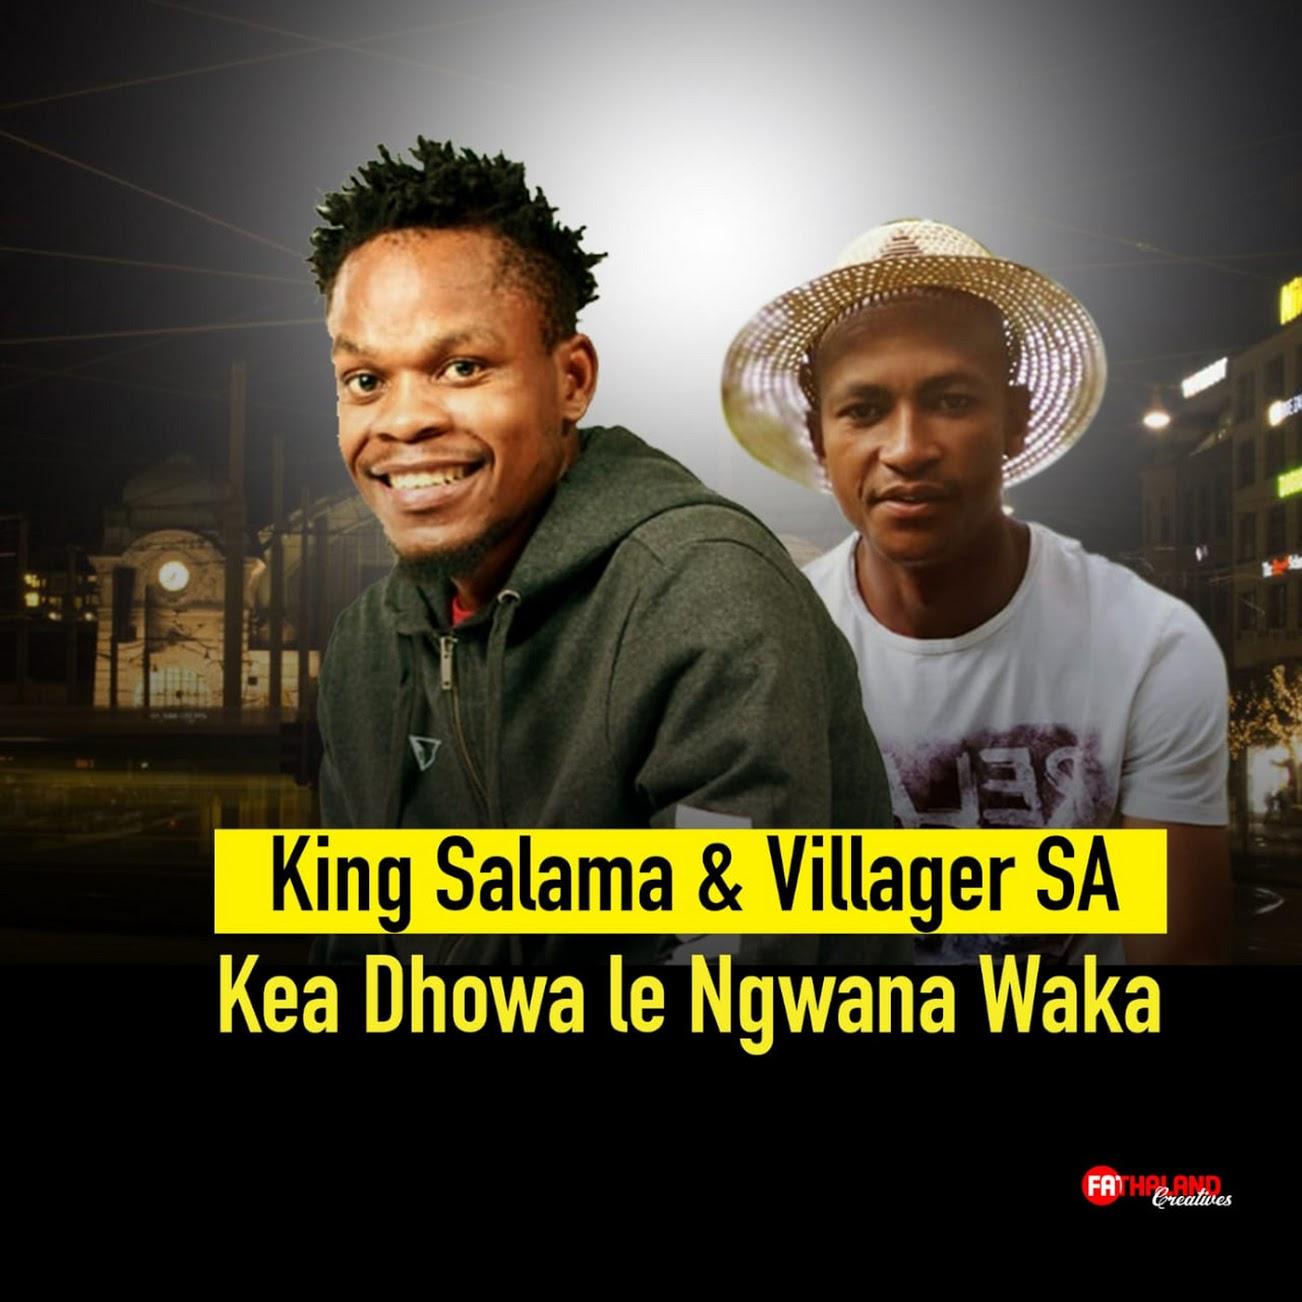 King Salama Villager SA Kea Dhowa Le Ngwana Waka - King Salama Ft. Villager SA – Kea Dhowa Le Ngwana Waka